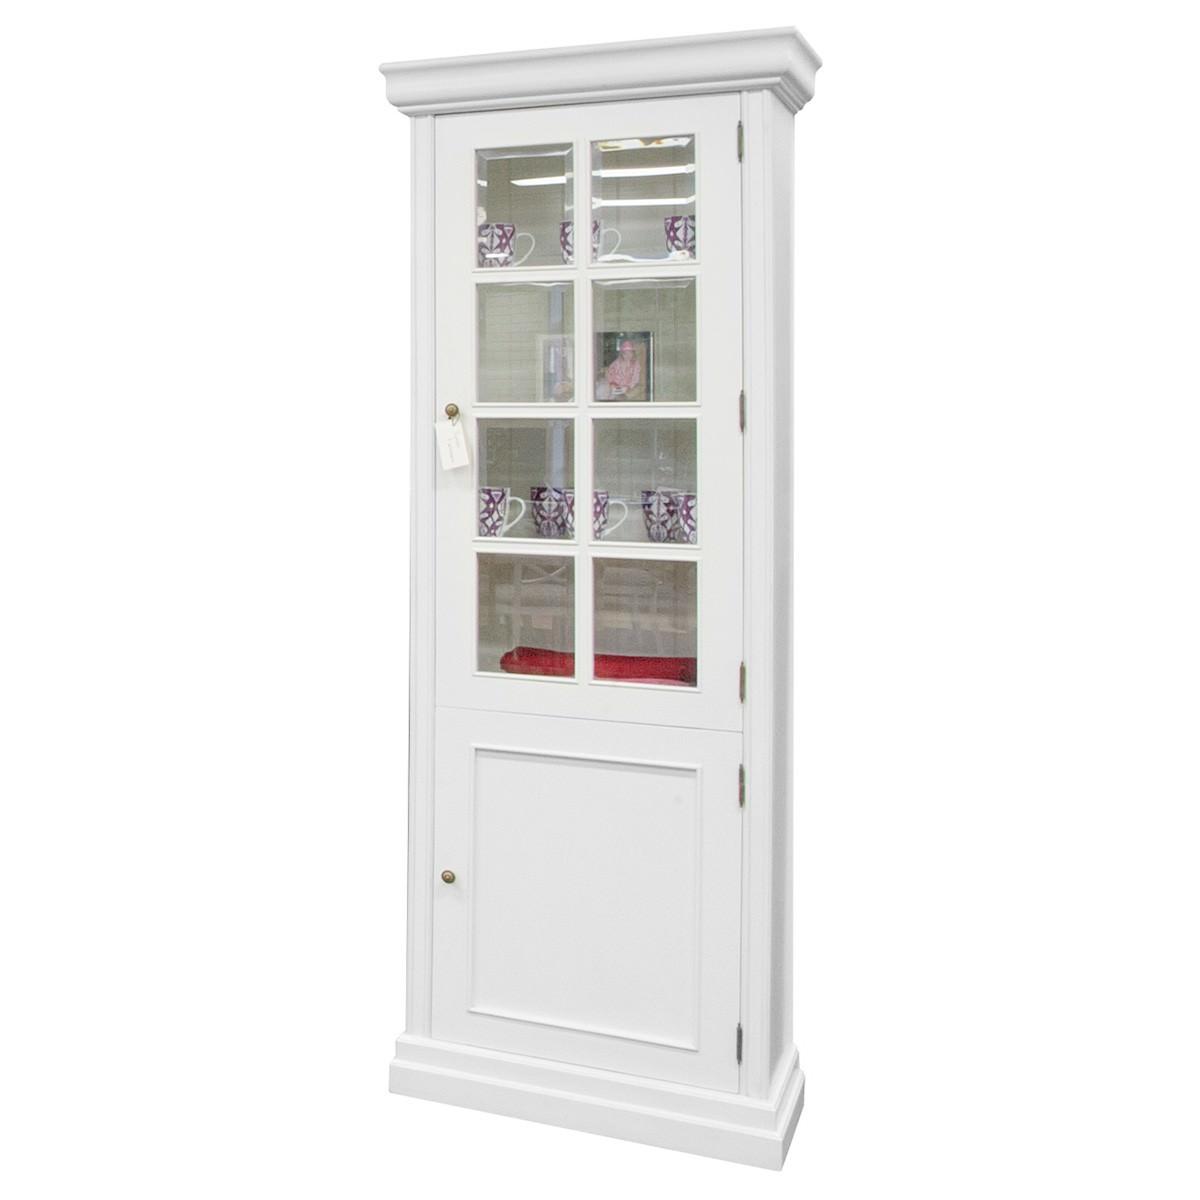 Davenport Mahogany Single Display Cabinet, White